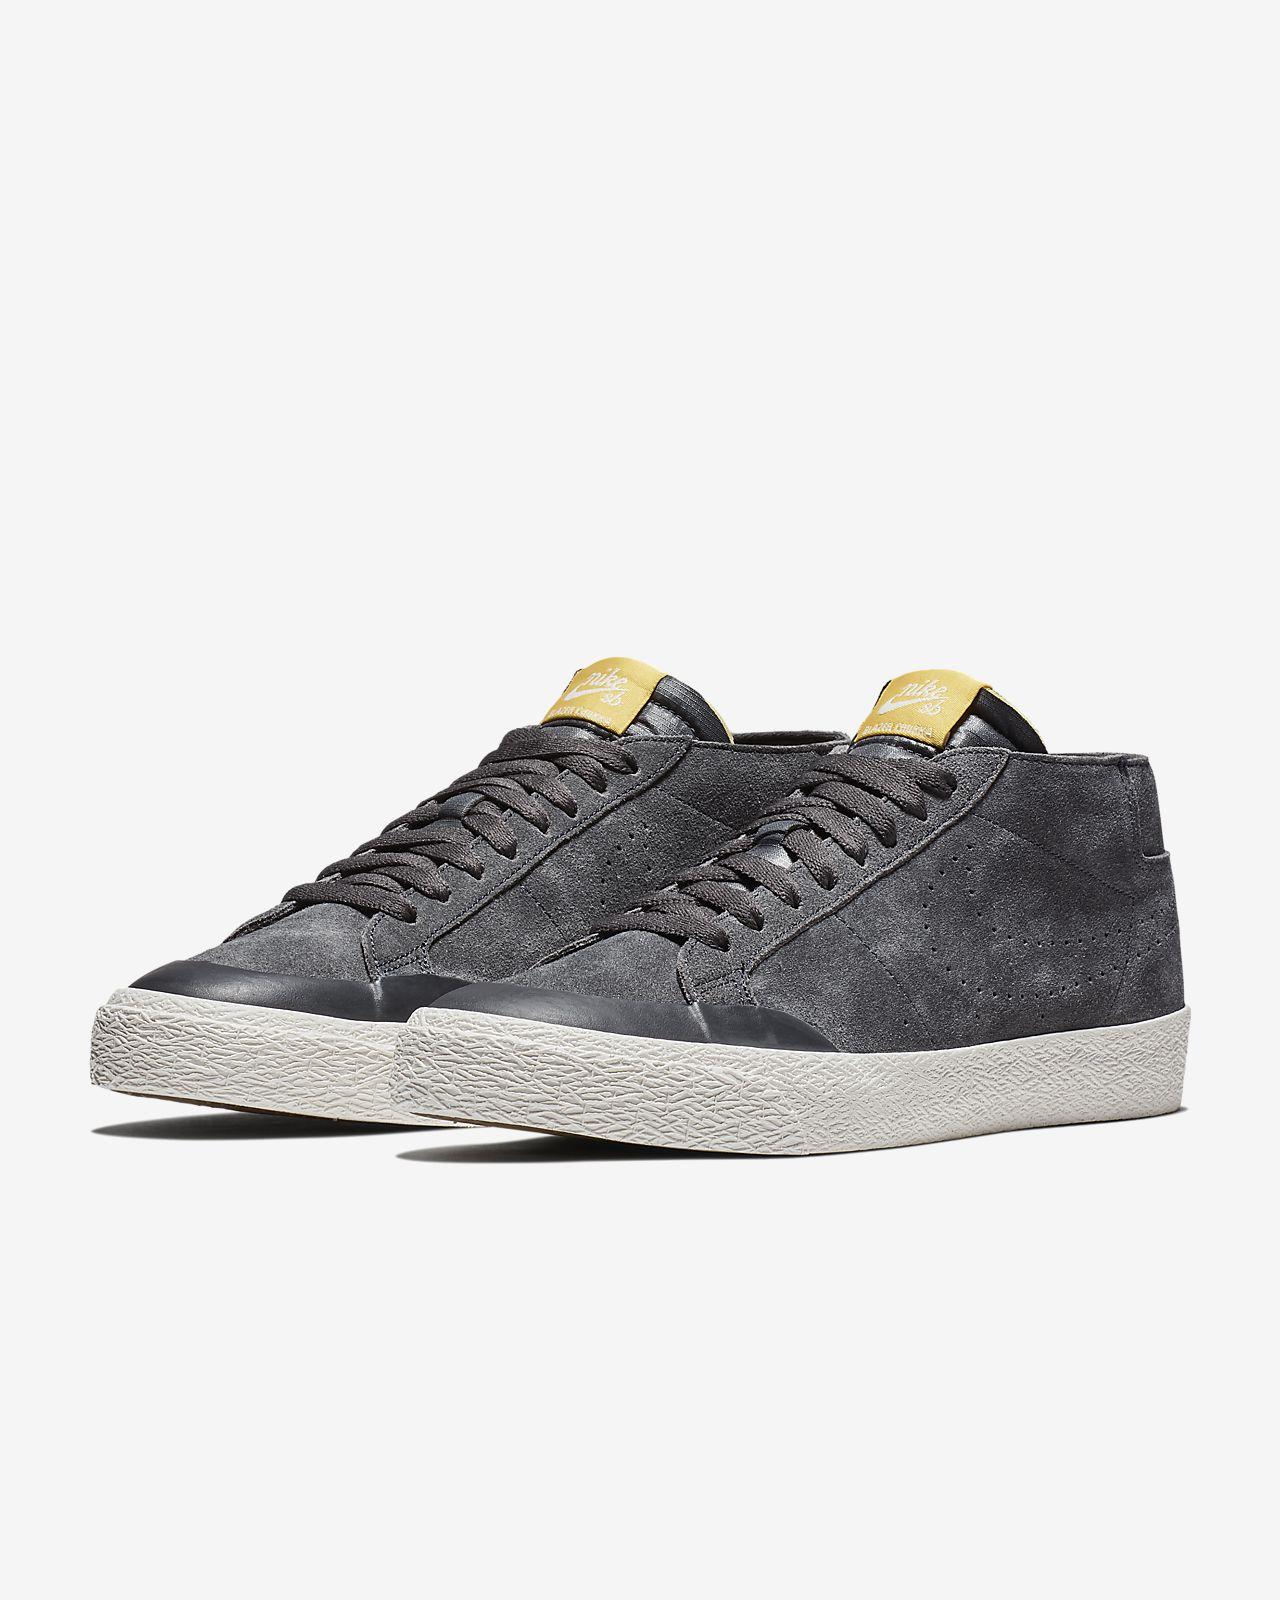 55e5eed7cab0 Nike SB Zoom Blazer Chukka XT Men s Skateboarding Shoe. Nike.com